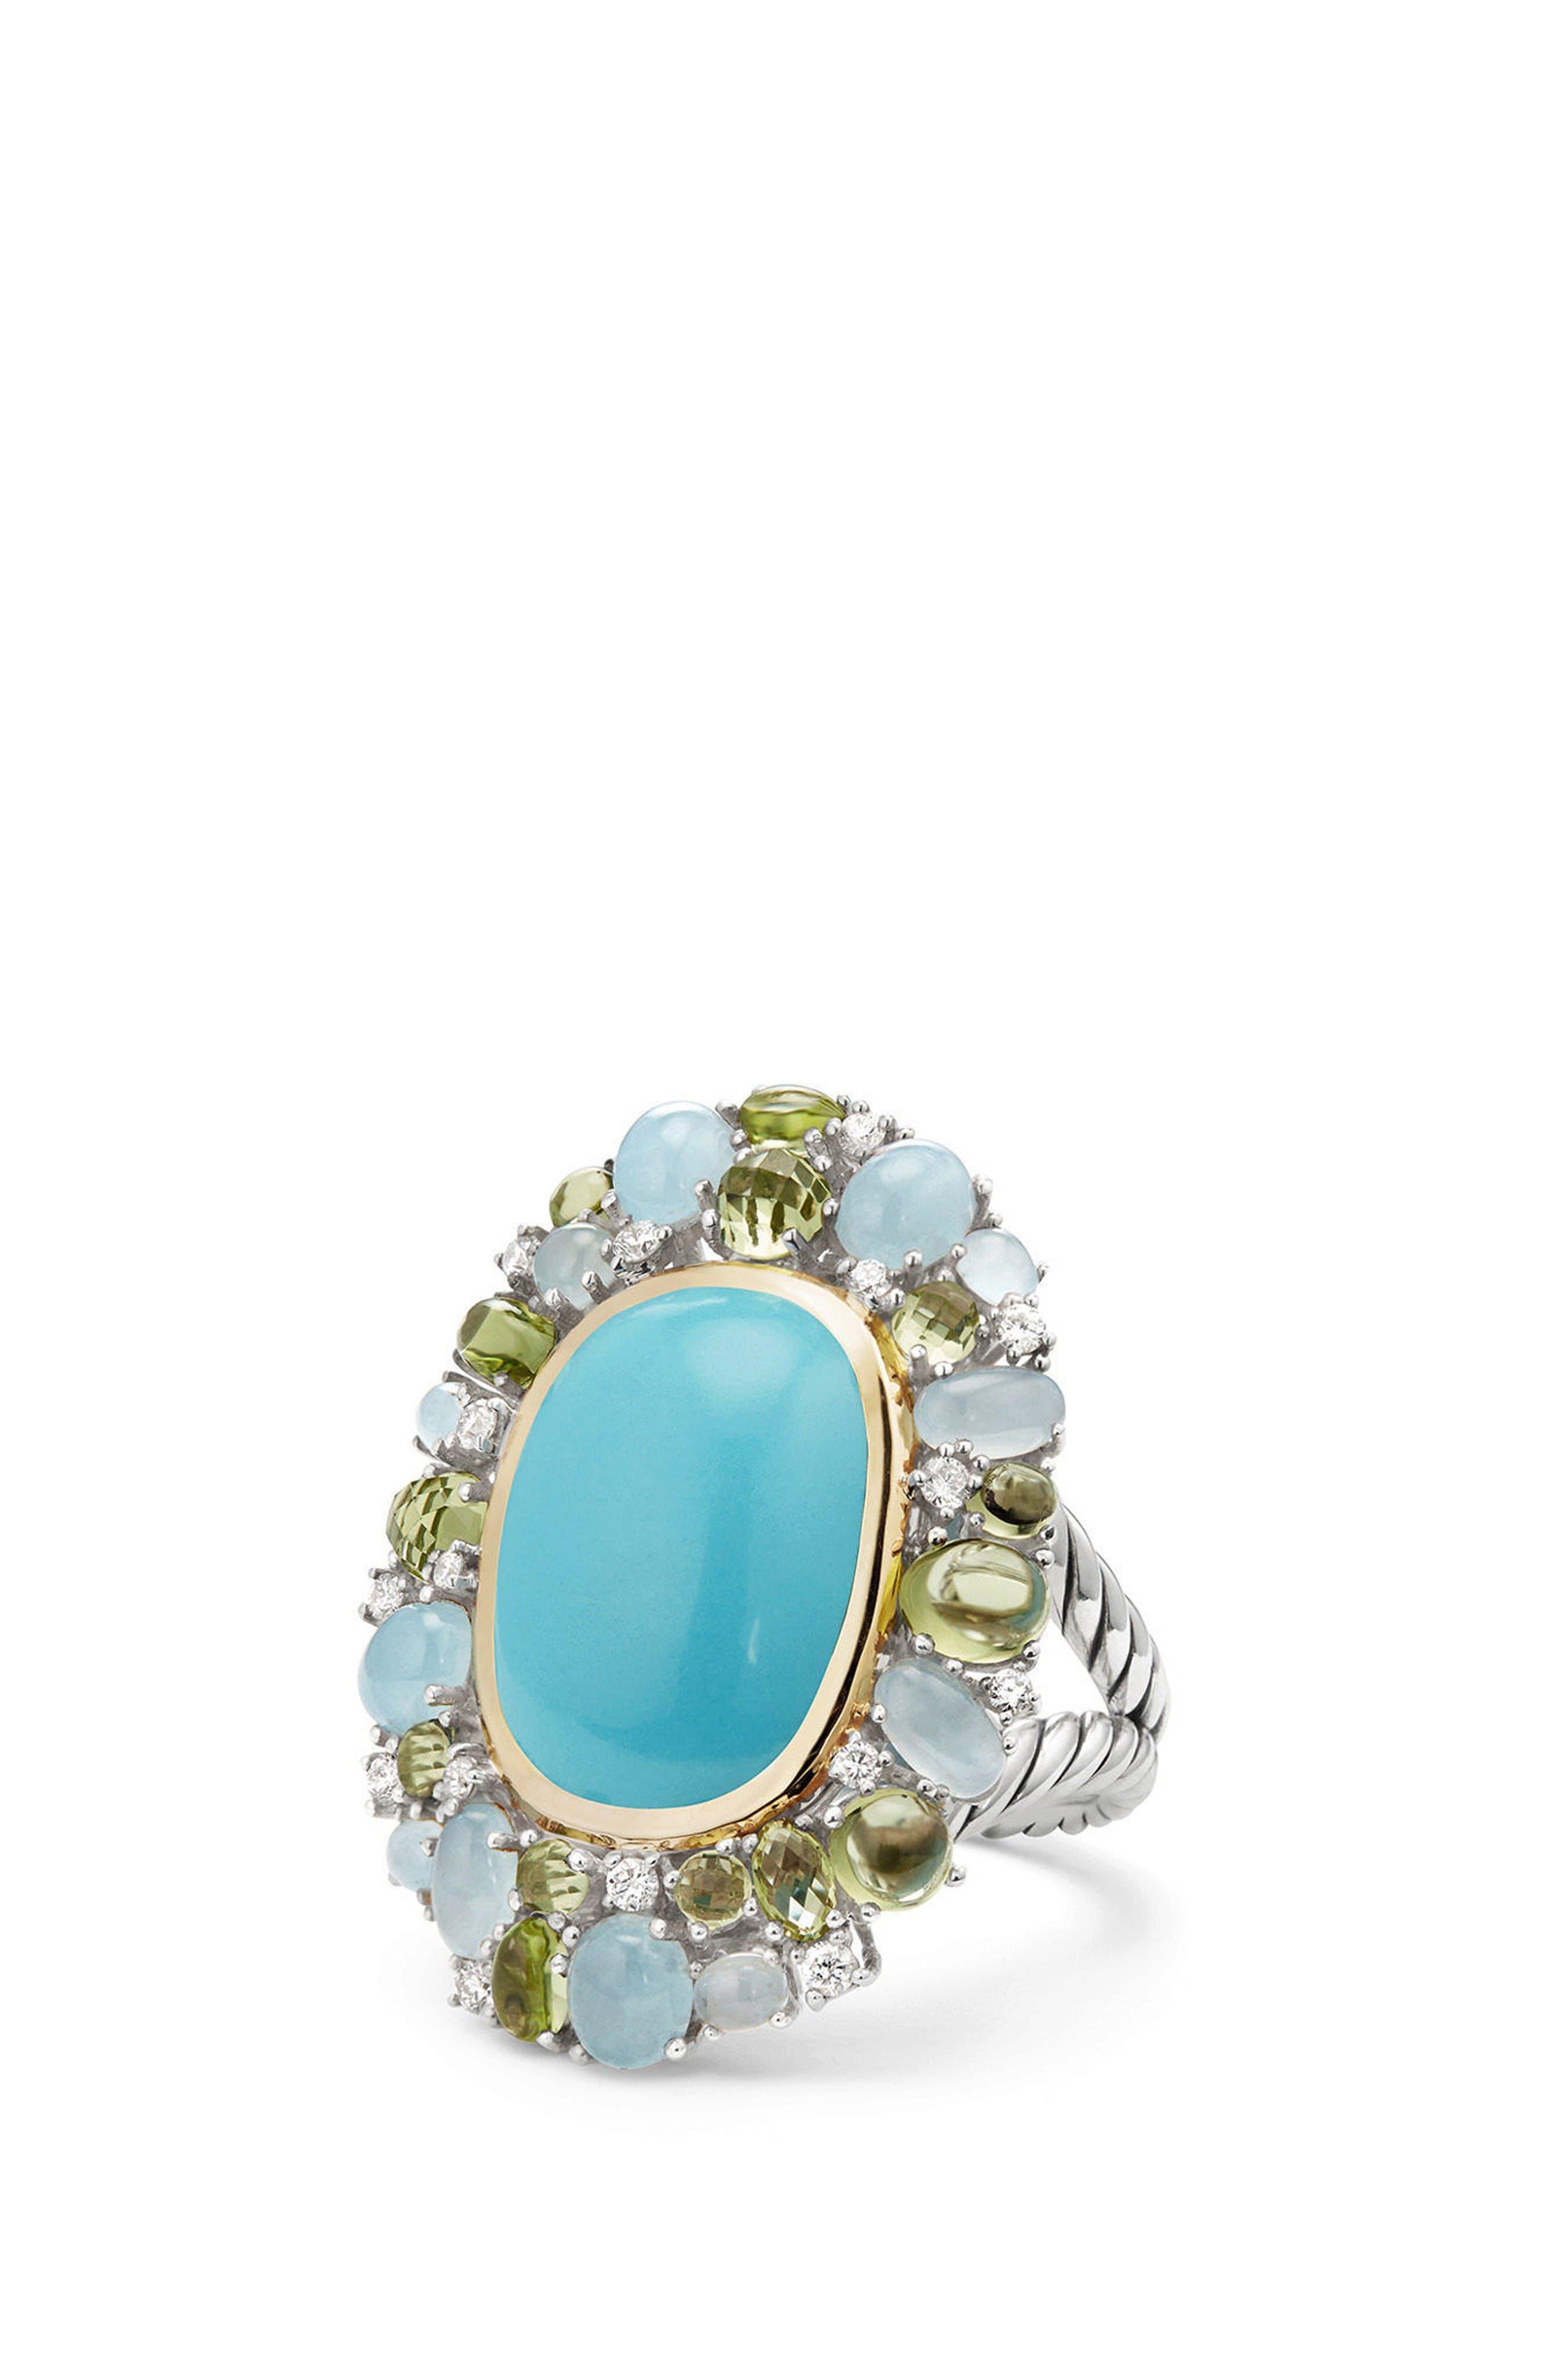 DAVID YURMAN Mustique Statement Ring with Diamonds